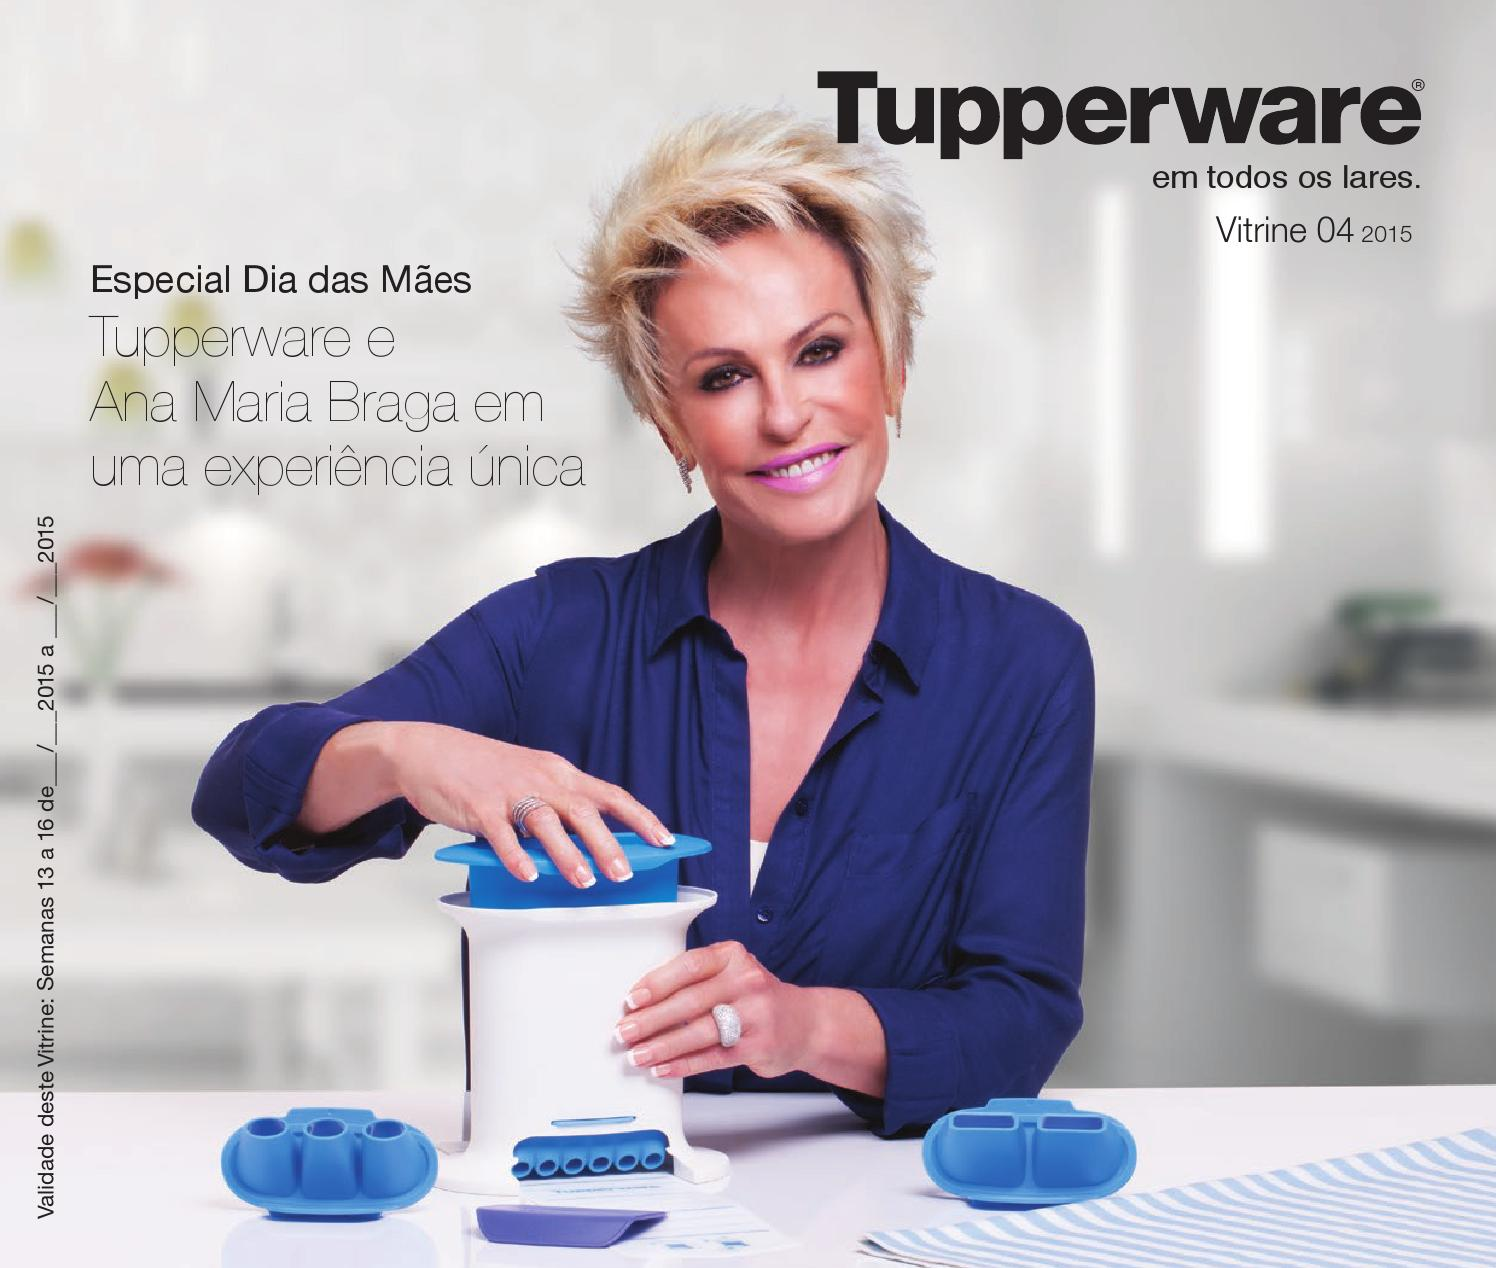 Tupperware fr likewise Tuppjakbar further Raffle Ticket Templates as well Arroz Griego furthermore Imagenes Chistosas Para El Facebook. on tupperware espanol